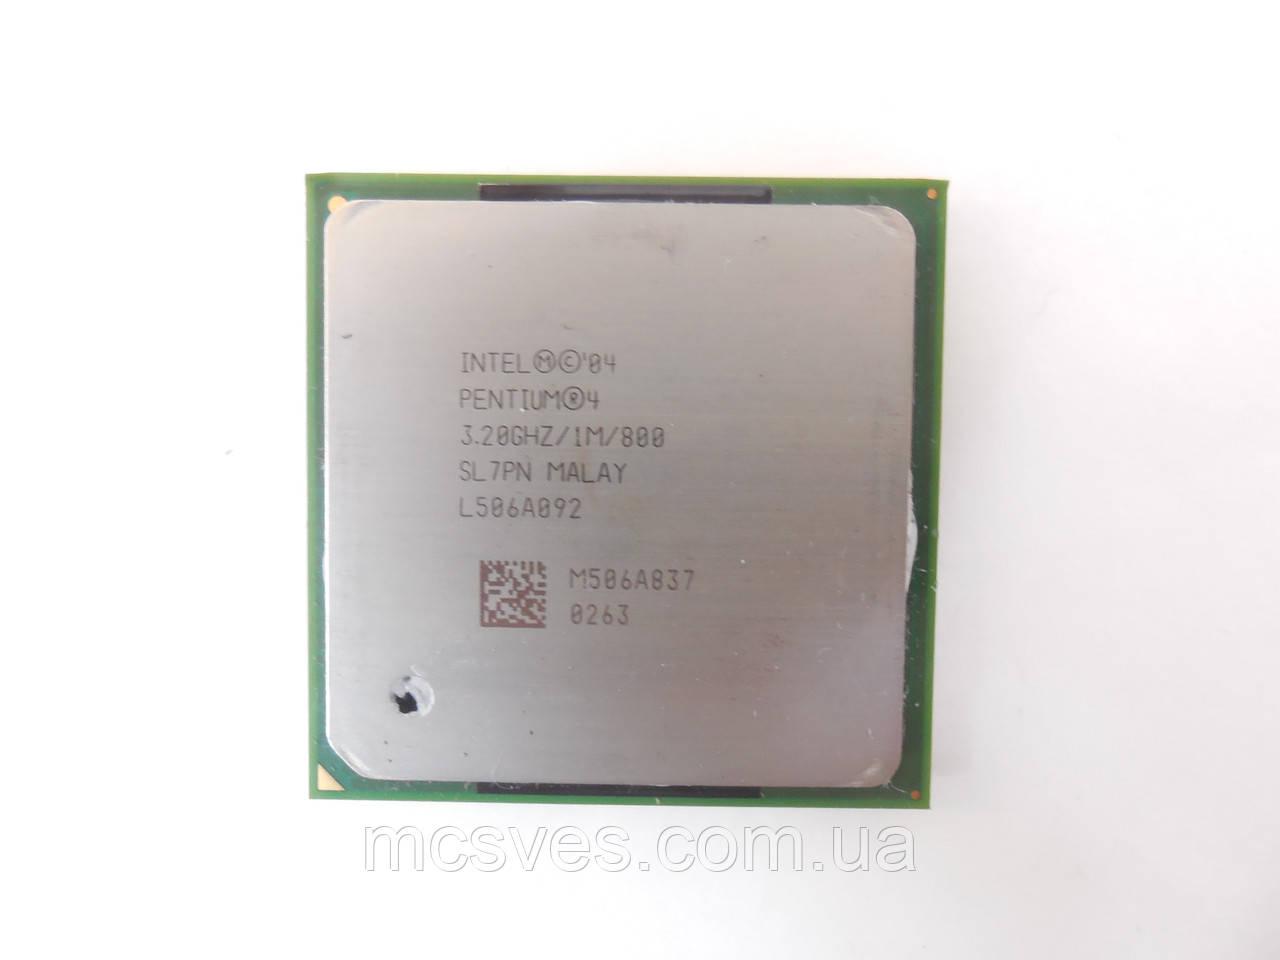 Процессор Intel Pentium 4 3.2 ГГЦ (сокет 478), Prescott 4 HT 3.2GHz 800MHz 1MB SL7PN